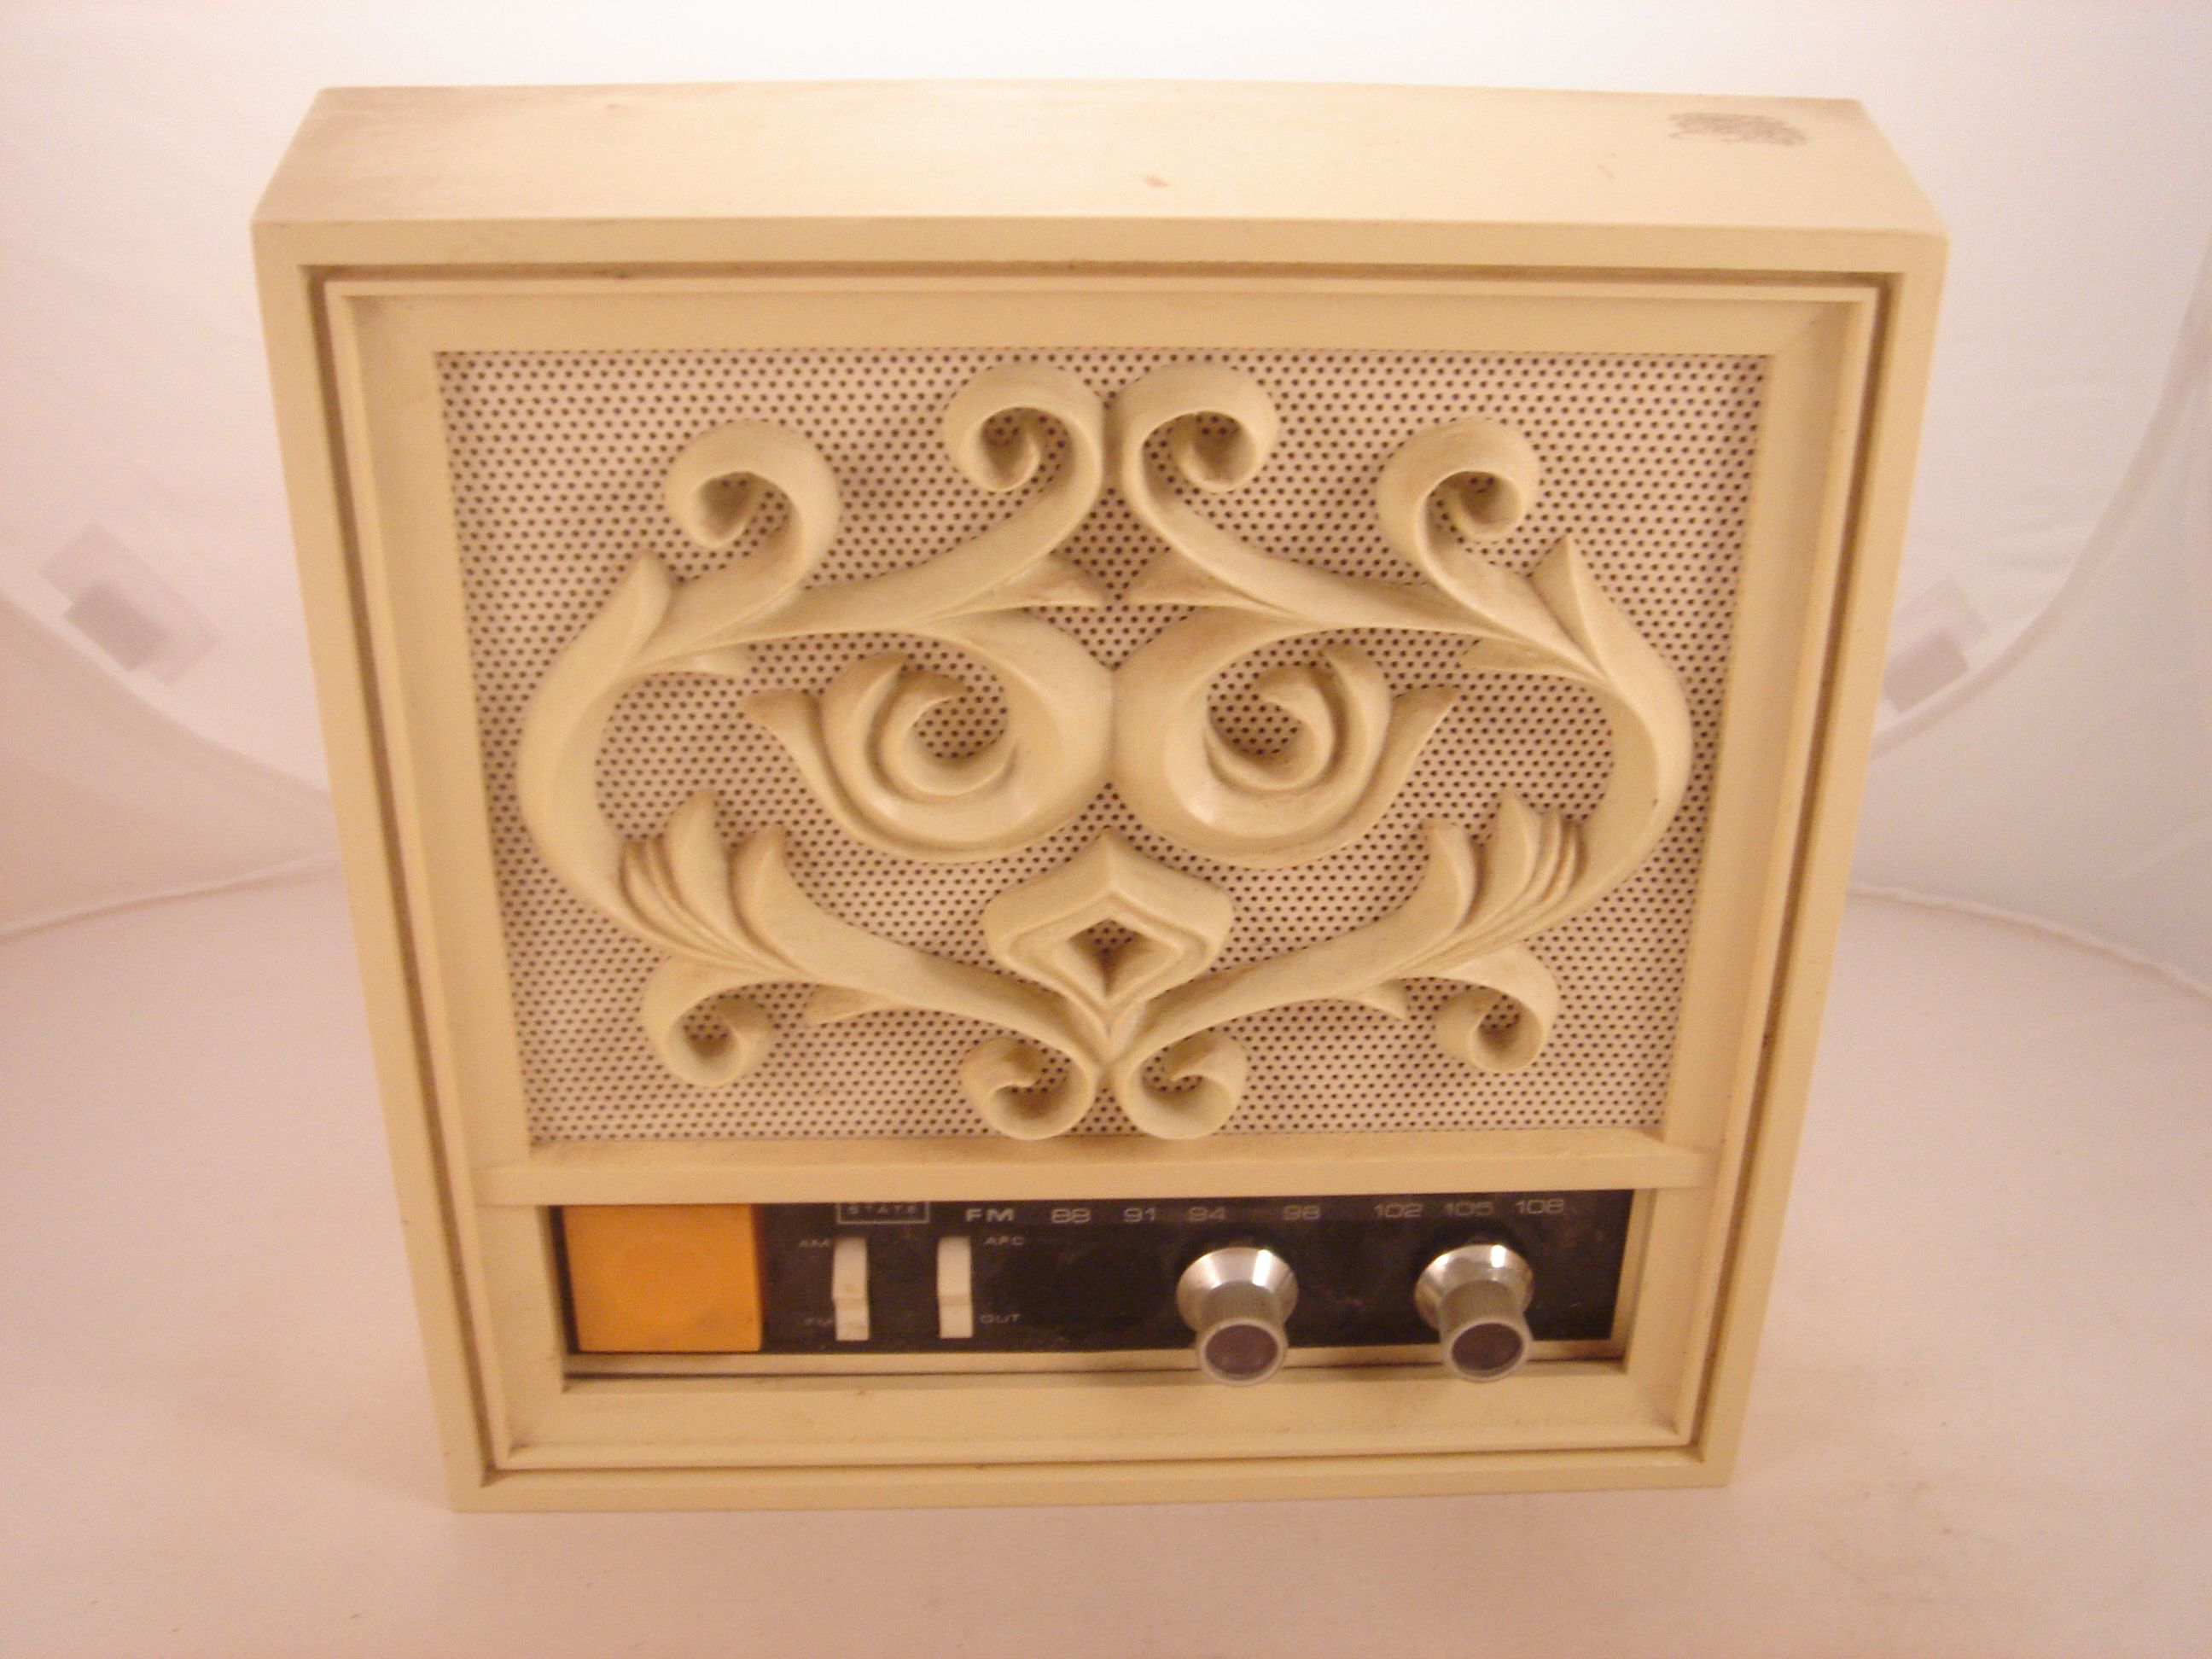 Vintage Silvertone Wall Mount Radio Retro Decor Decorative Boxes Decor